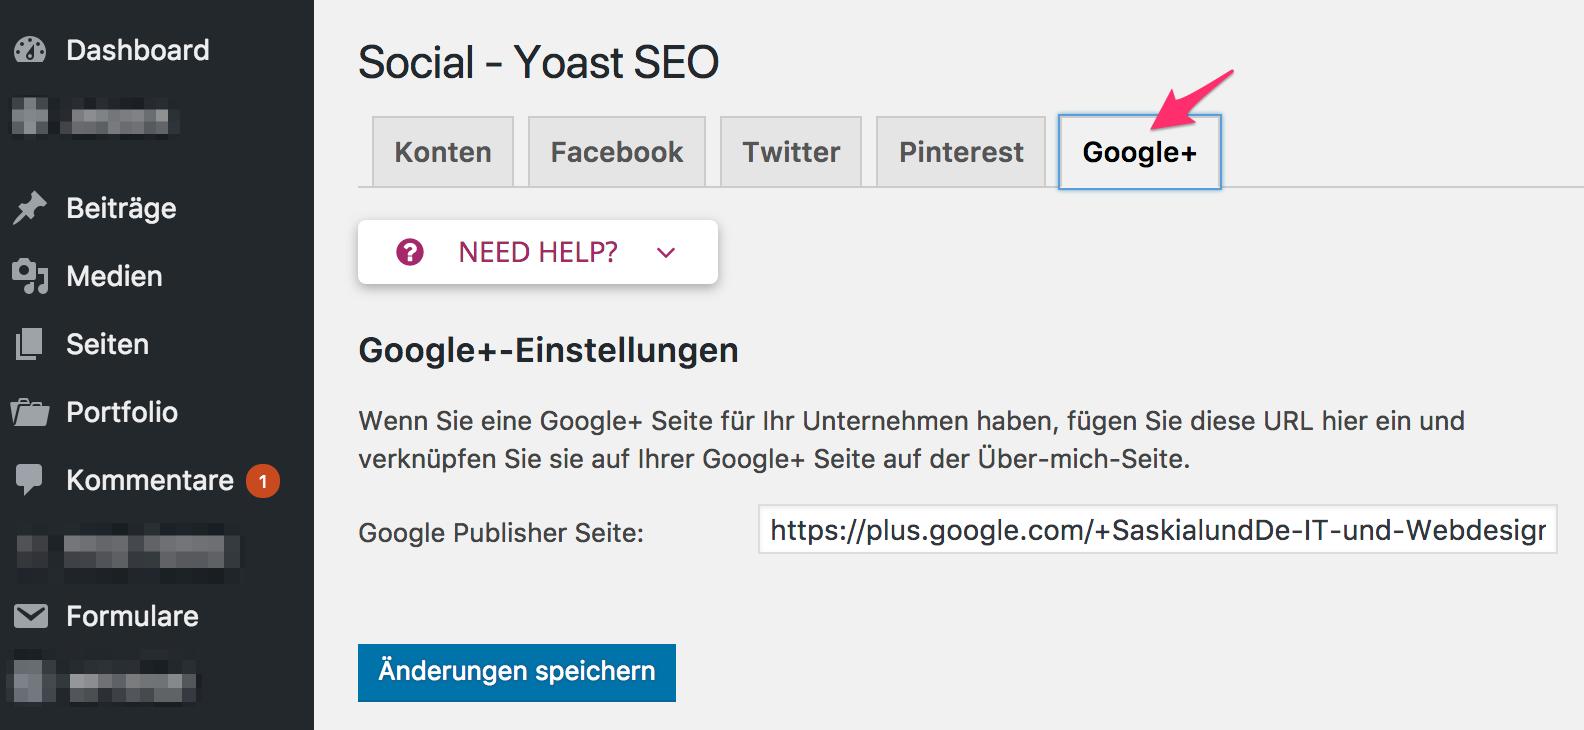 Yoast SEO Google+